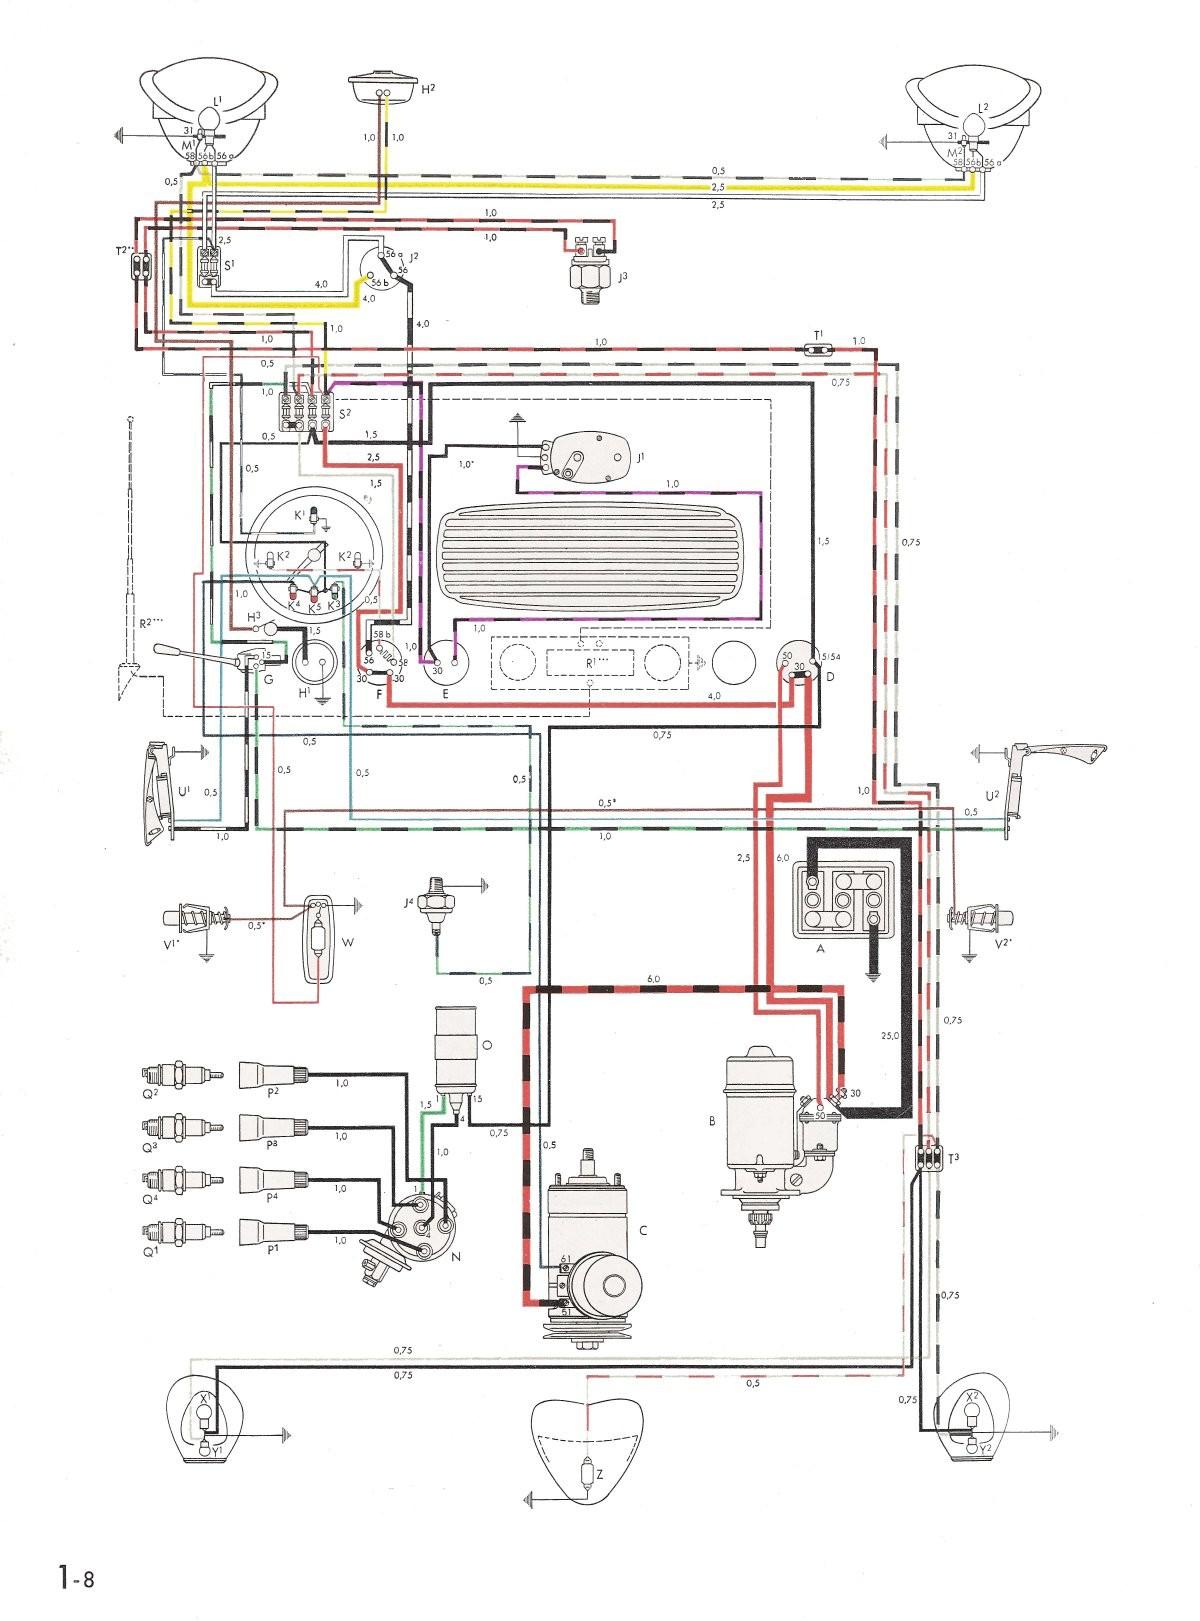 2001 vw beetle engine wiring diagram wire center \u2022 electric vw beetle 2001 vw beetle engine diagram 73 vw beetle wiring diagram wiring rh detoxicrecenze com 1973 vw